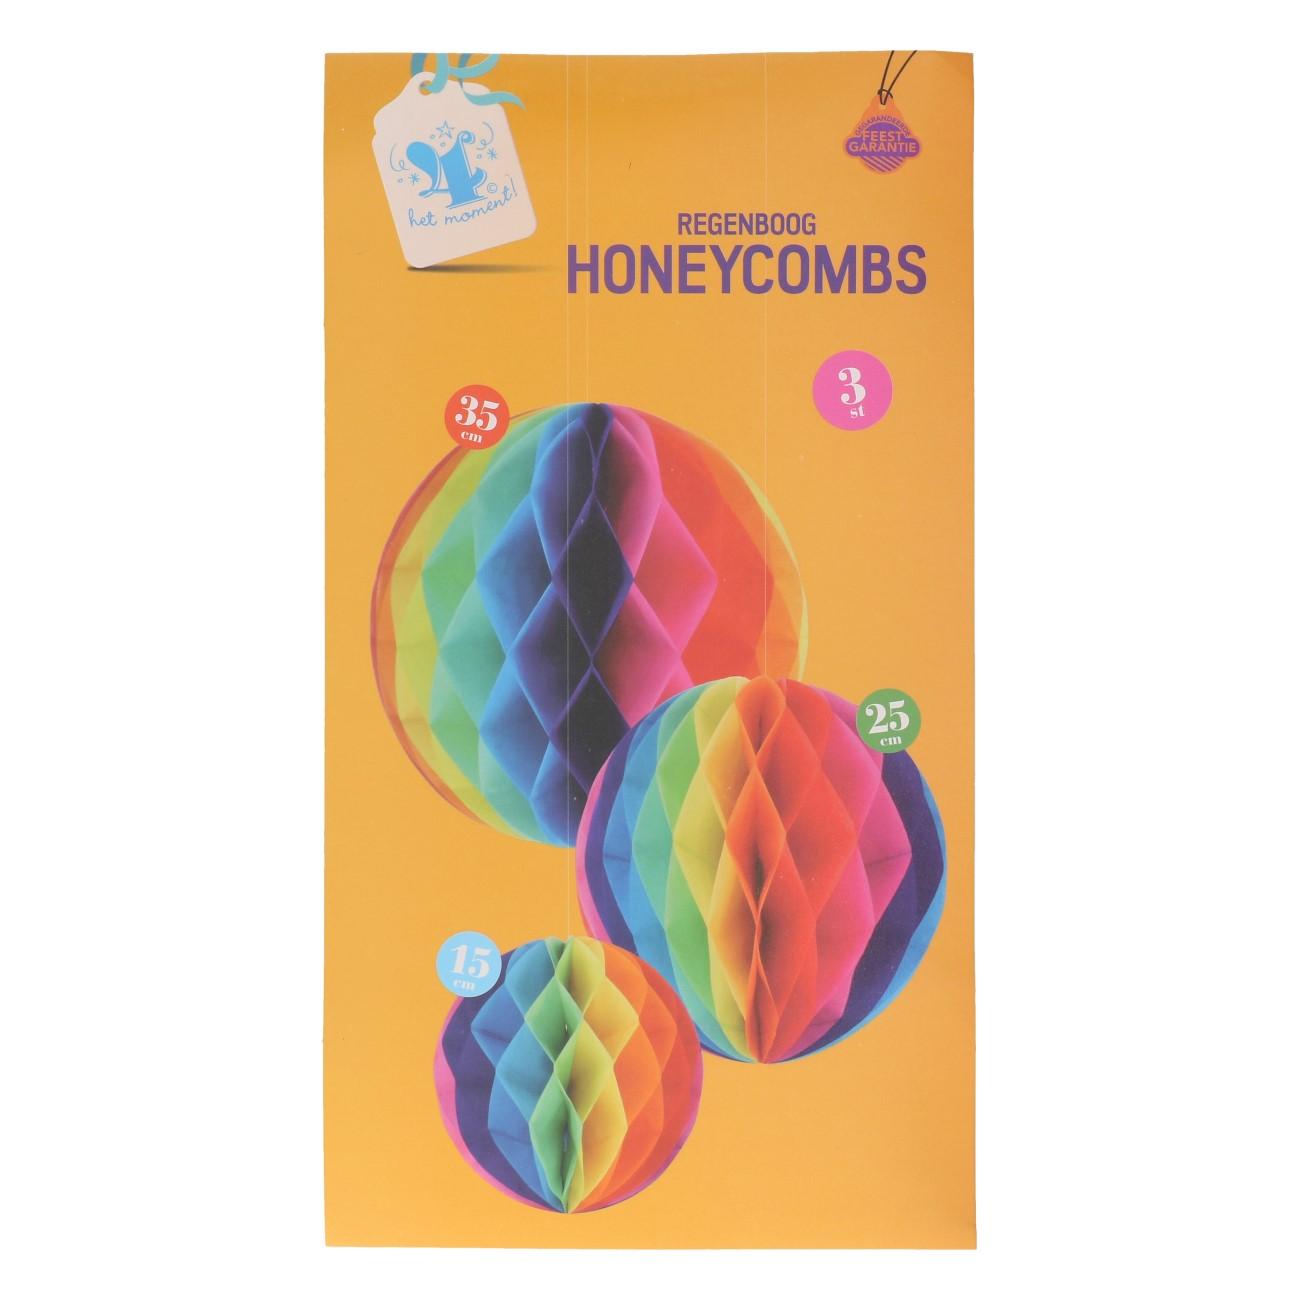 Honeycomb regenboog